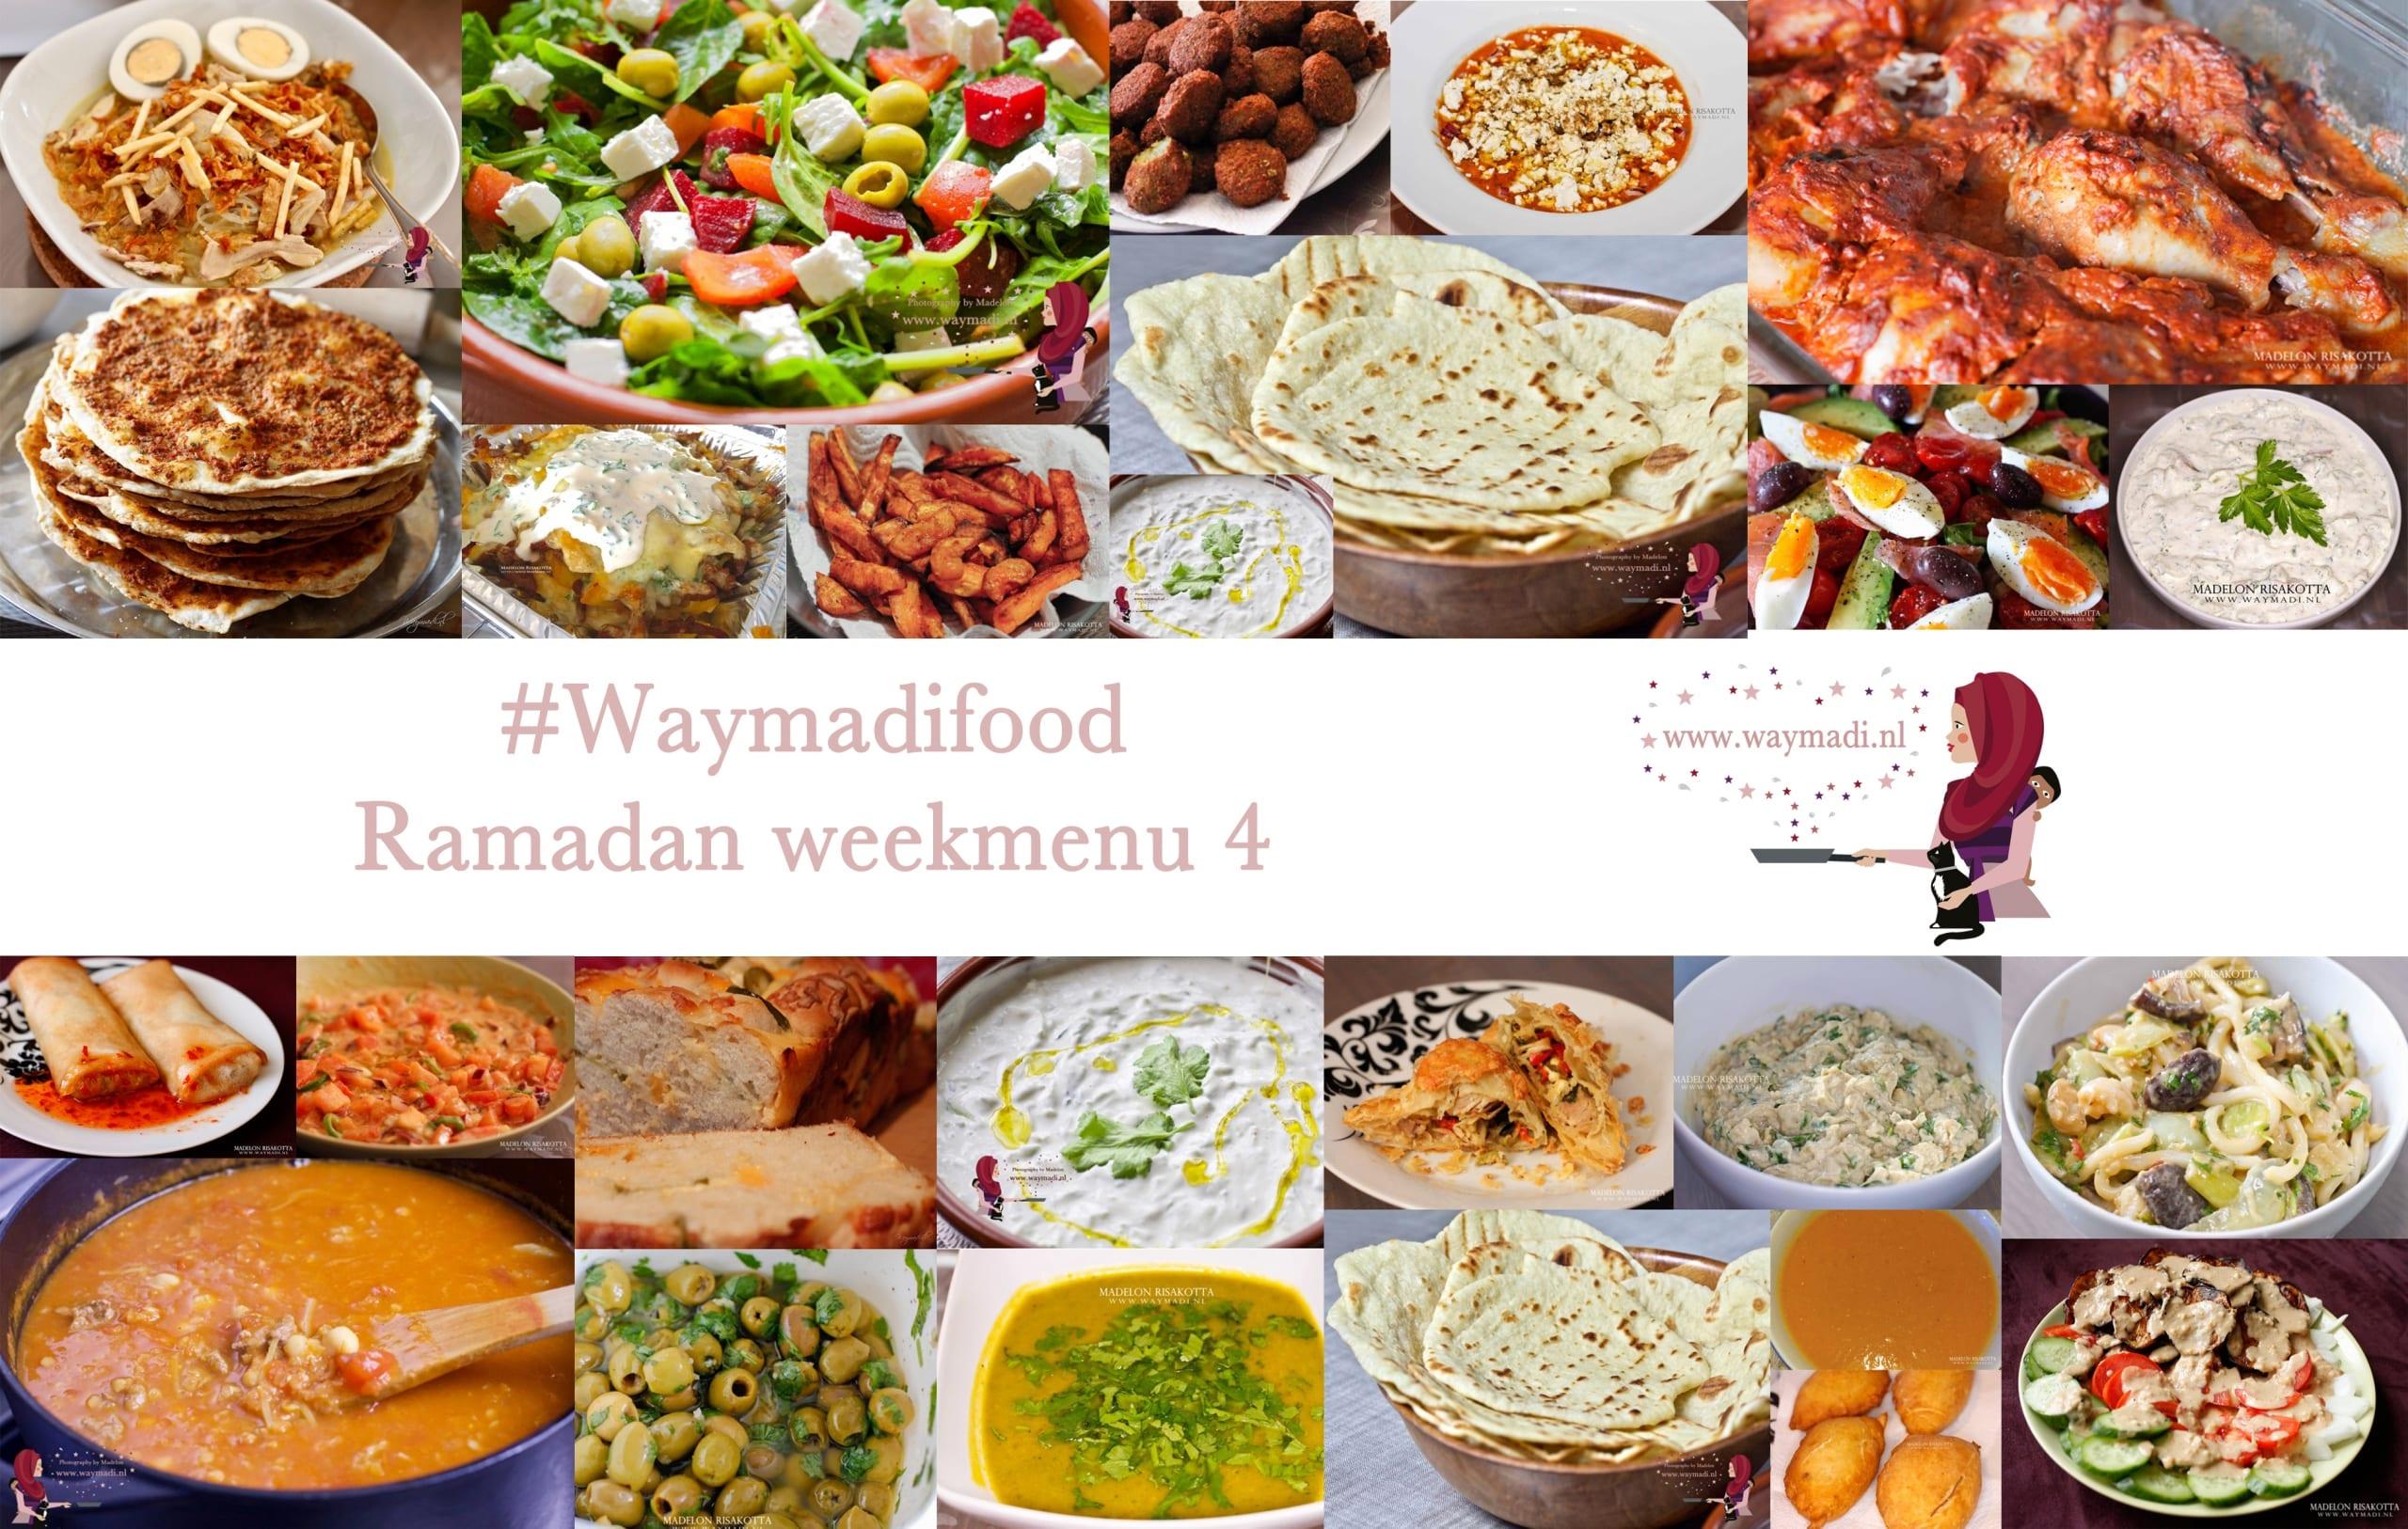 Ramadan weekmenu 4